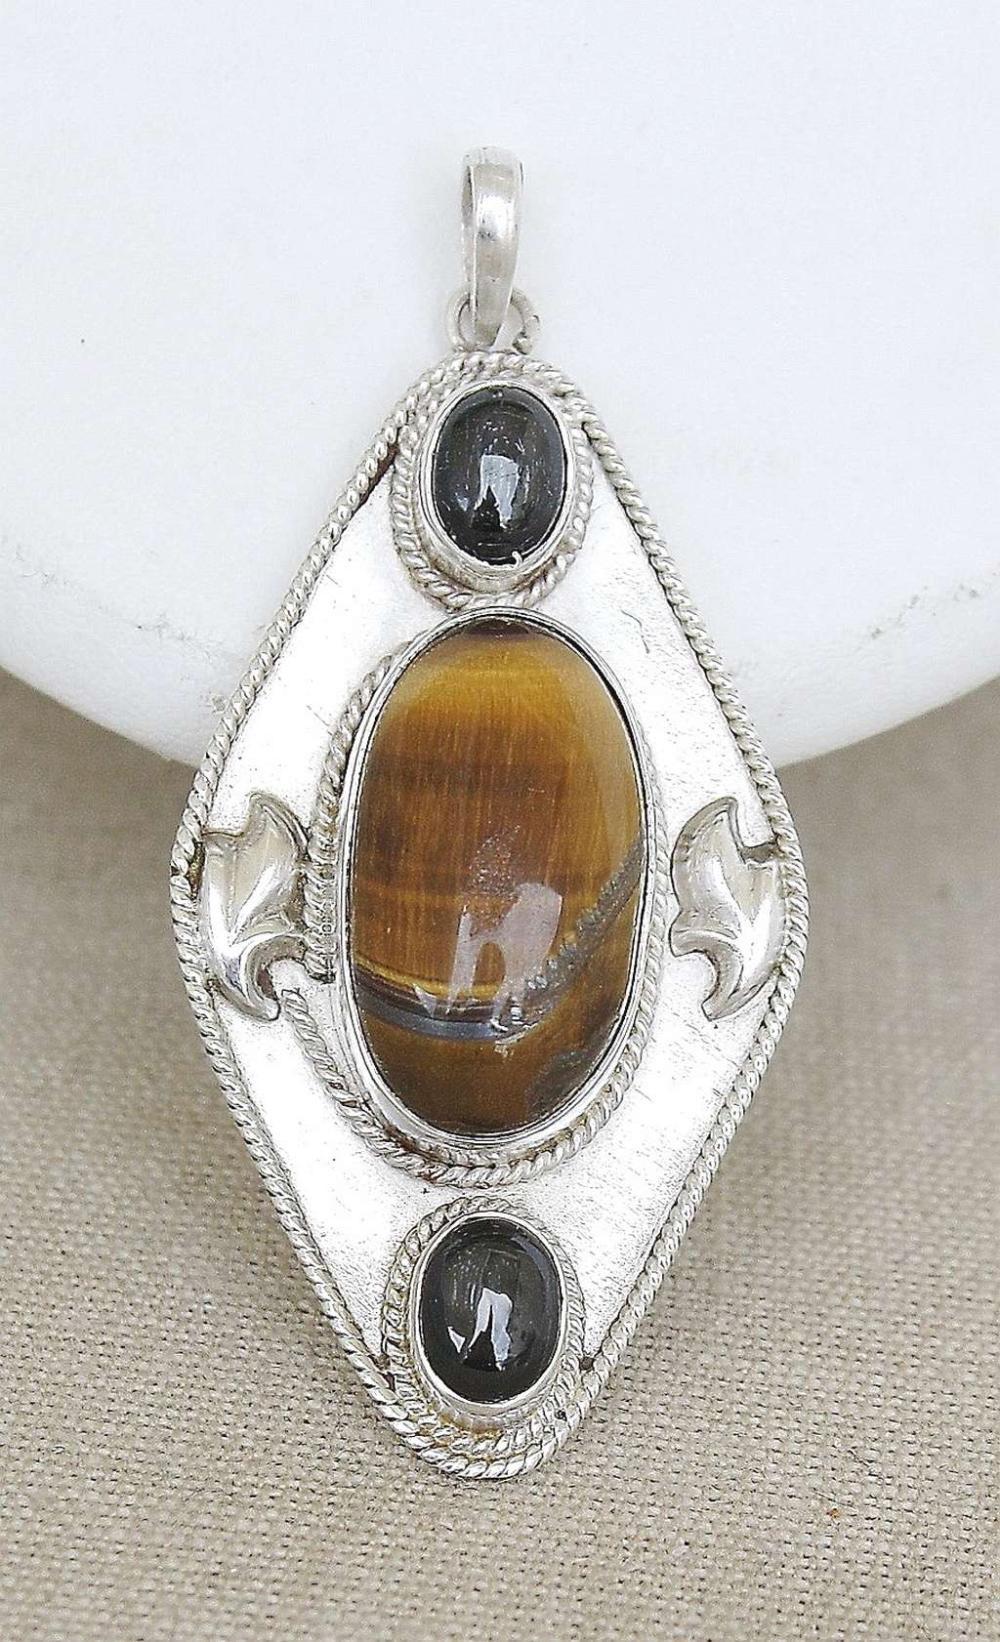 Vintage filigree silver sterling 925 large pendant set with tiger's eye and cat's eye, 18gr.